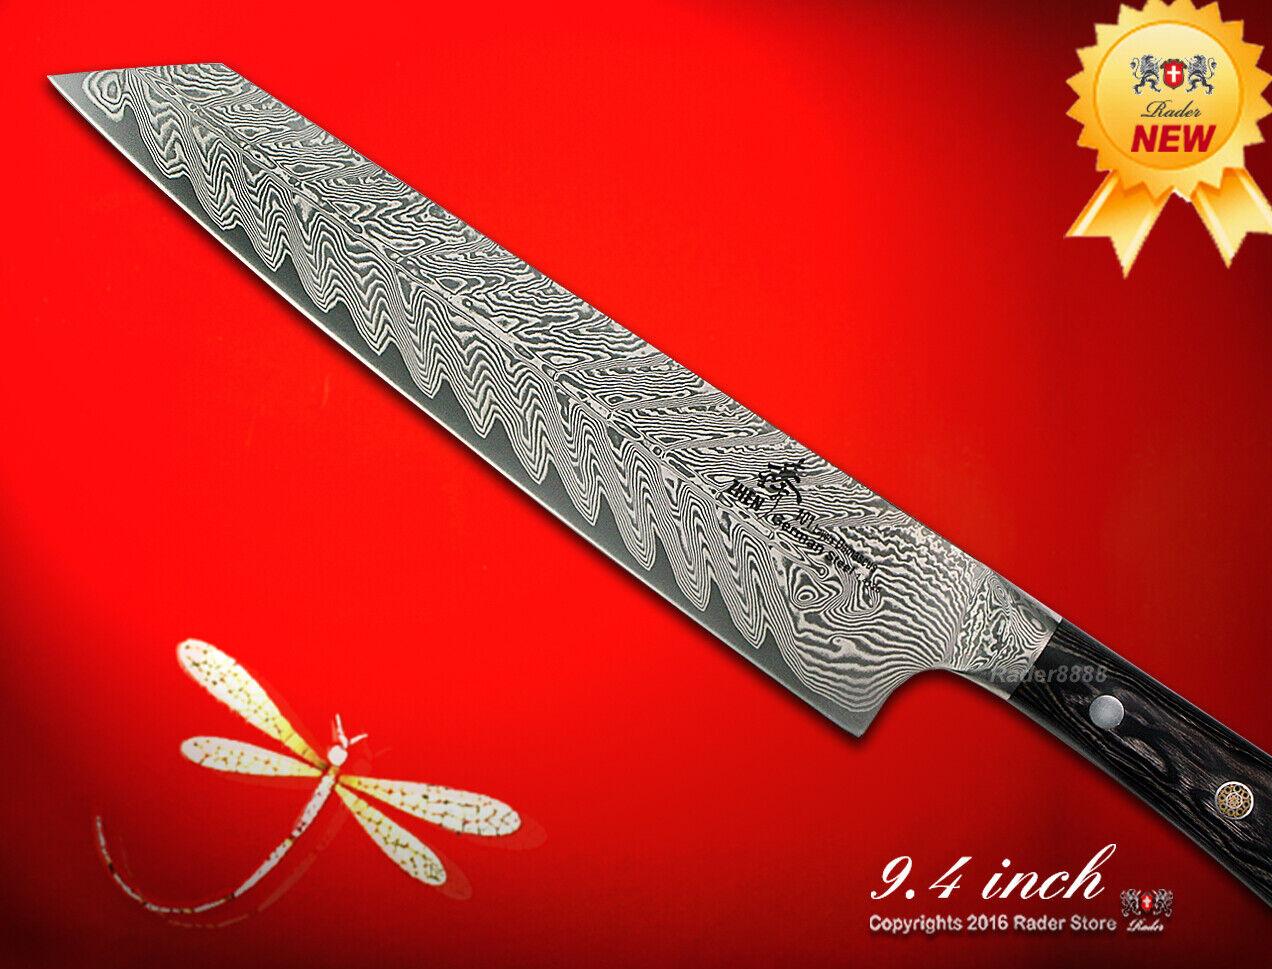 Handcraft Damascus 101 Layers Chef's Knife Kiritsuke 9.4  Full-Tang Wood Handle